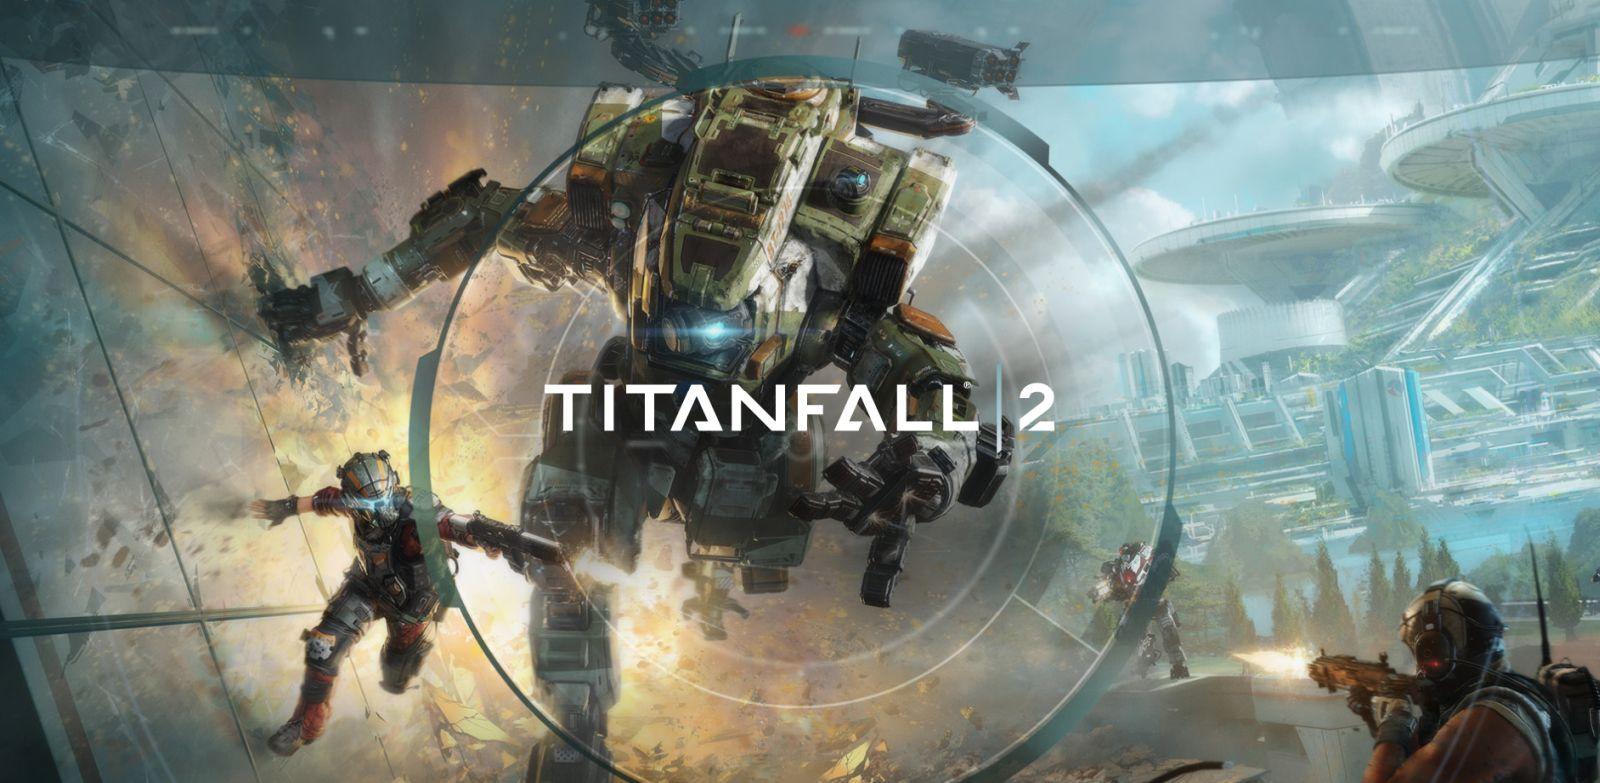 titanfall 2 singleplayer